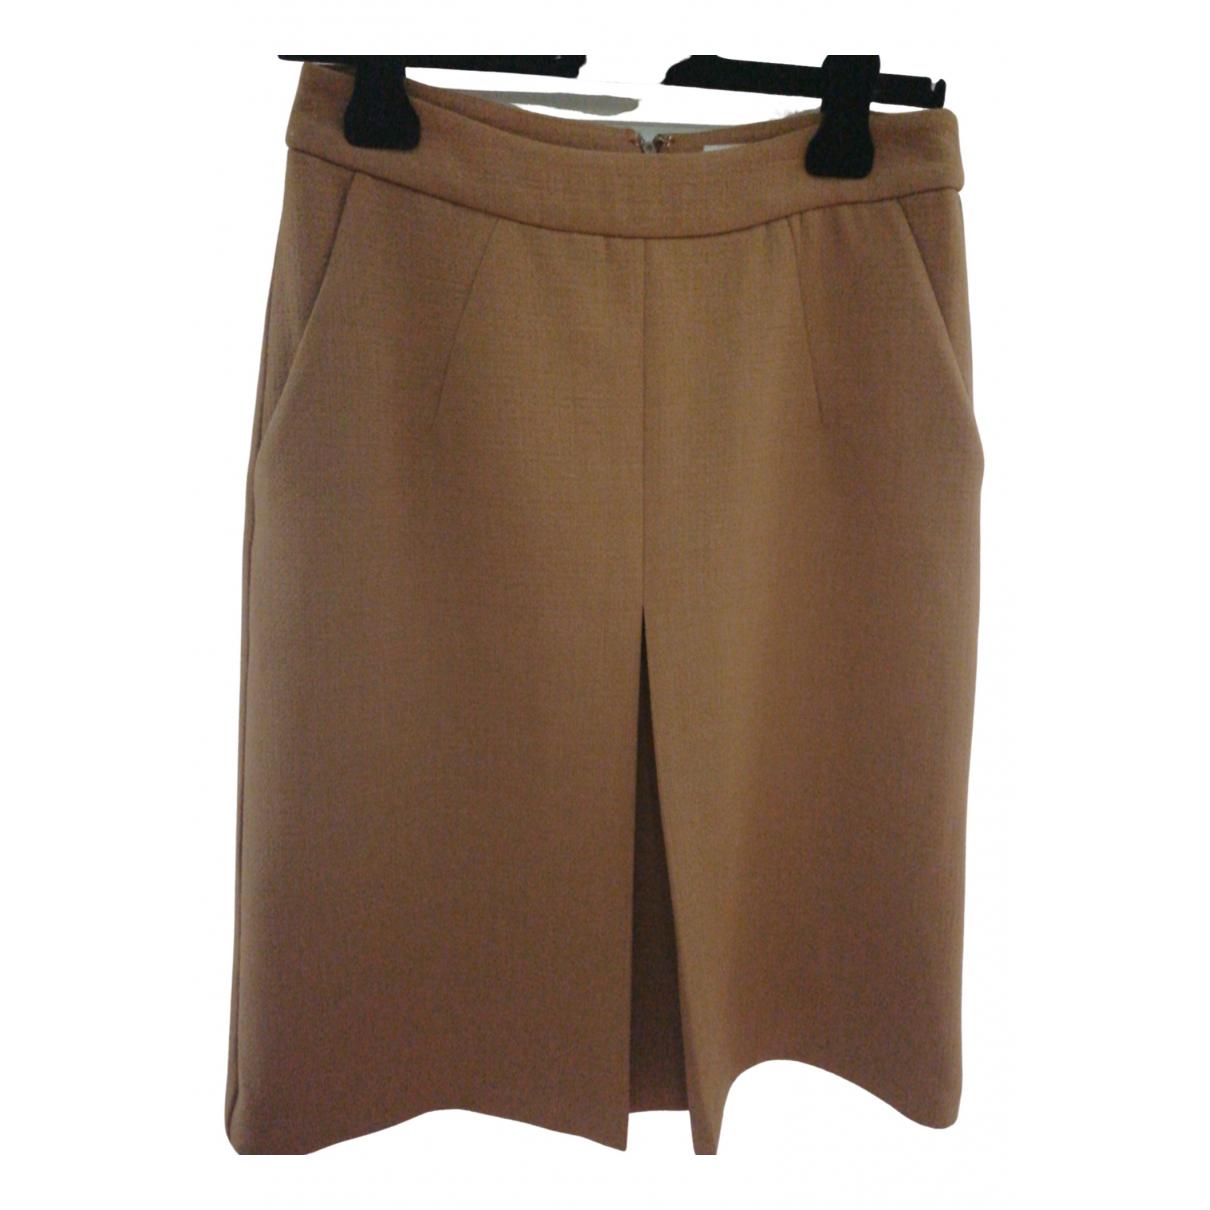 Essentiel Antwerp \N Camel Wool skirt for Women 36 FR